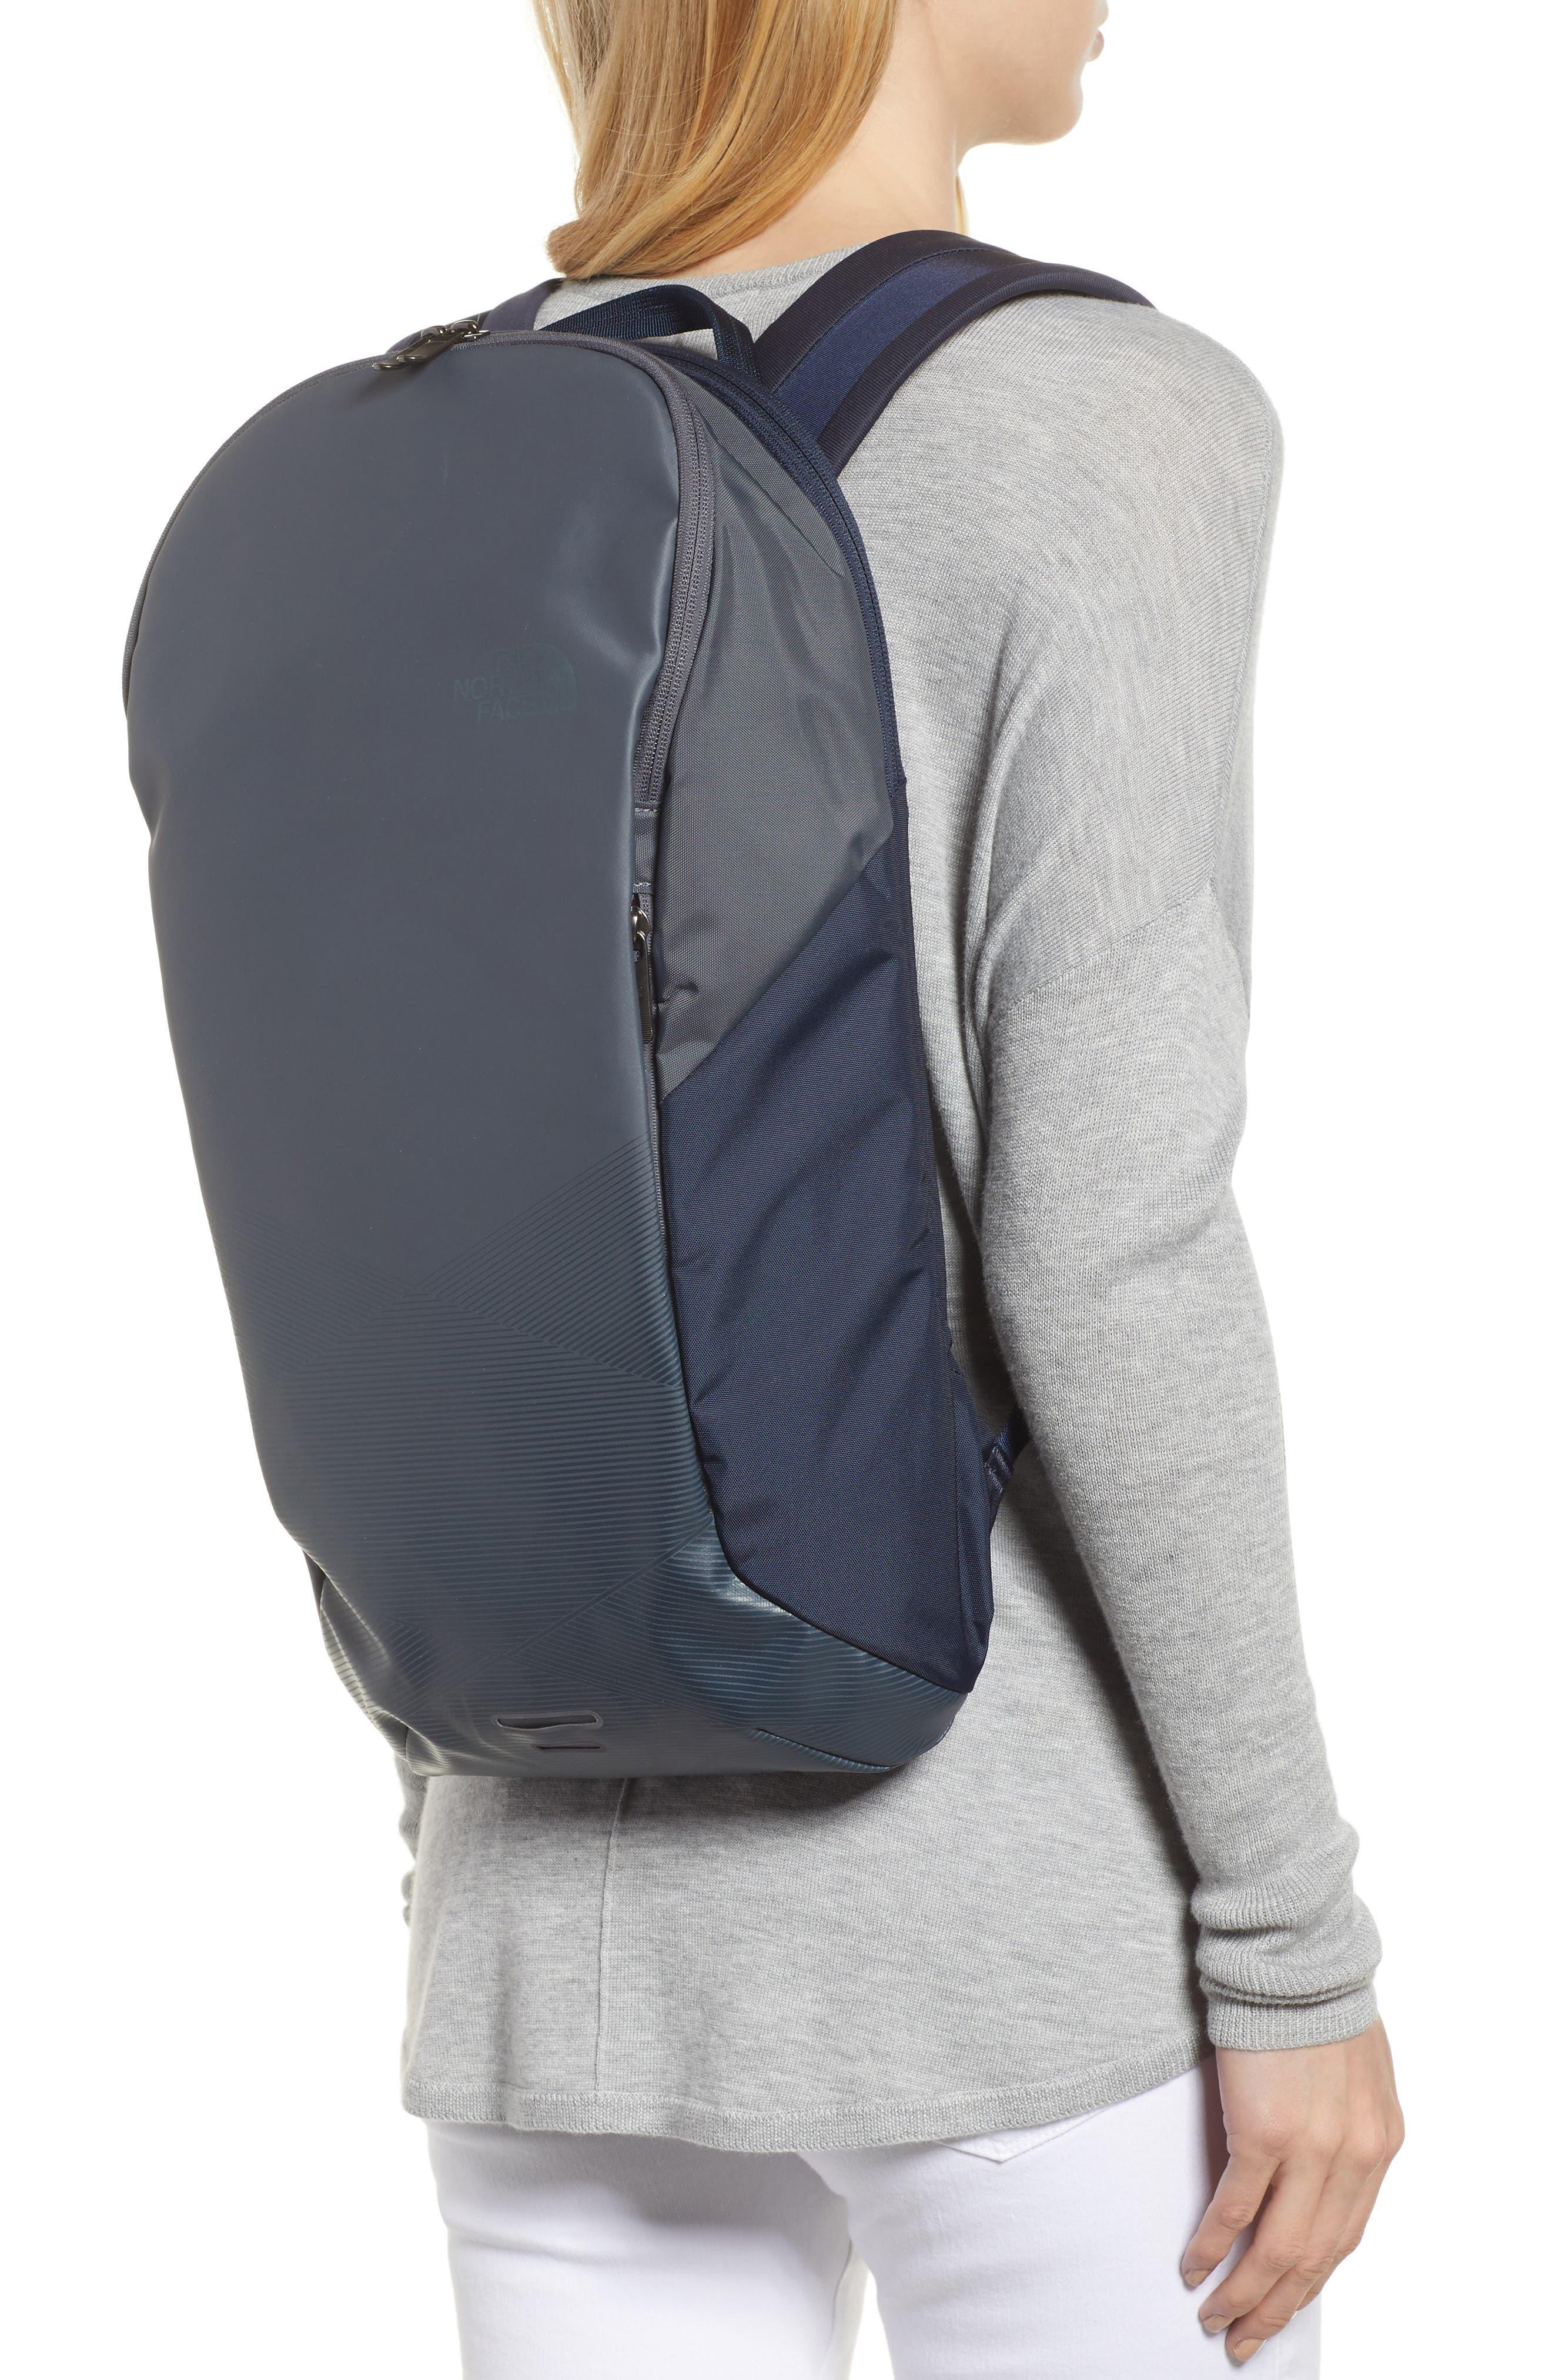 Kabyte Backpack,                             Alternate thumbnail 2, color,                             VANADIS GREY/ URBAN NAVY